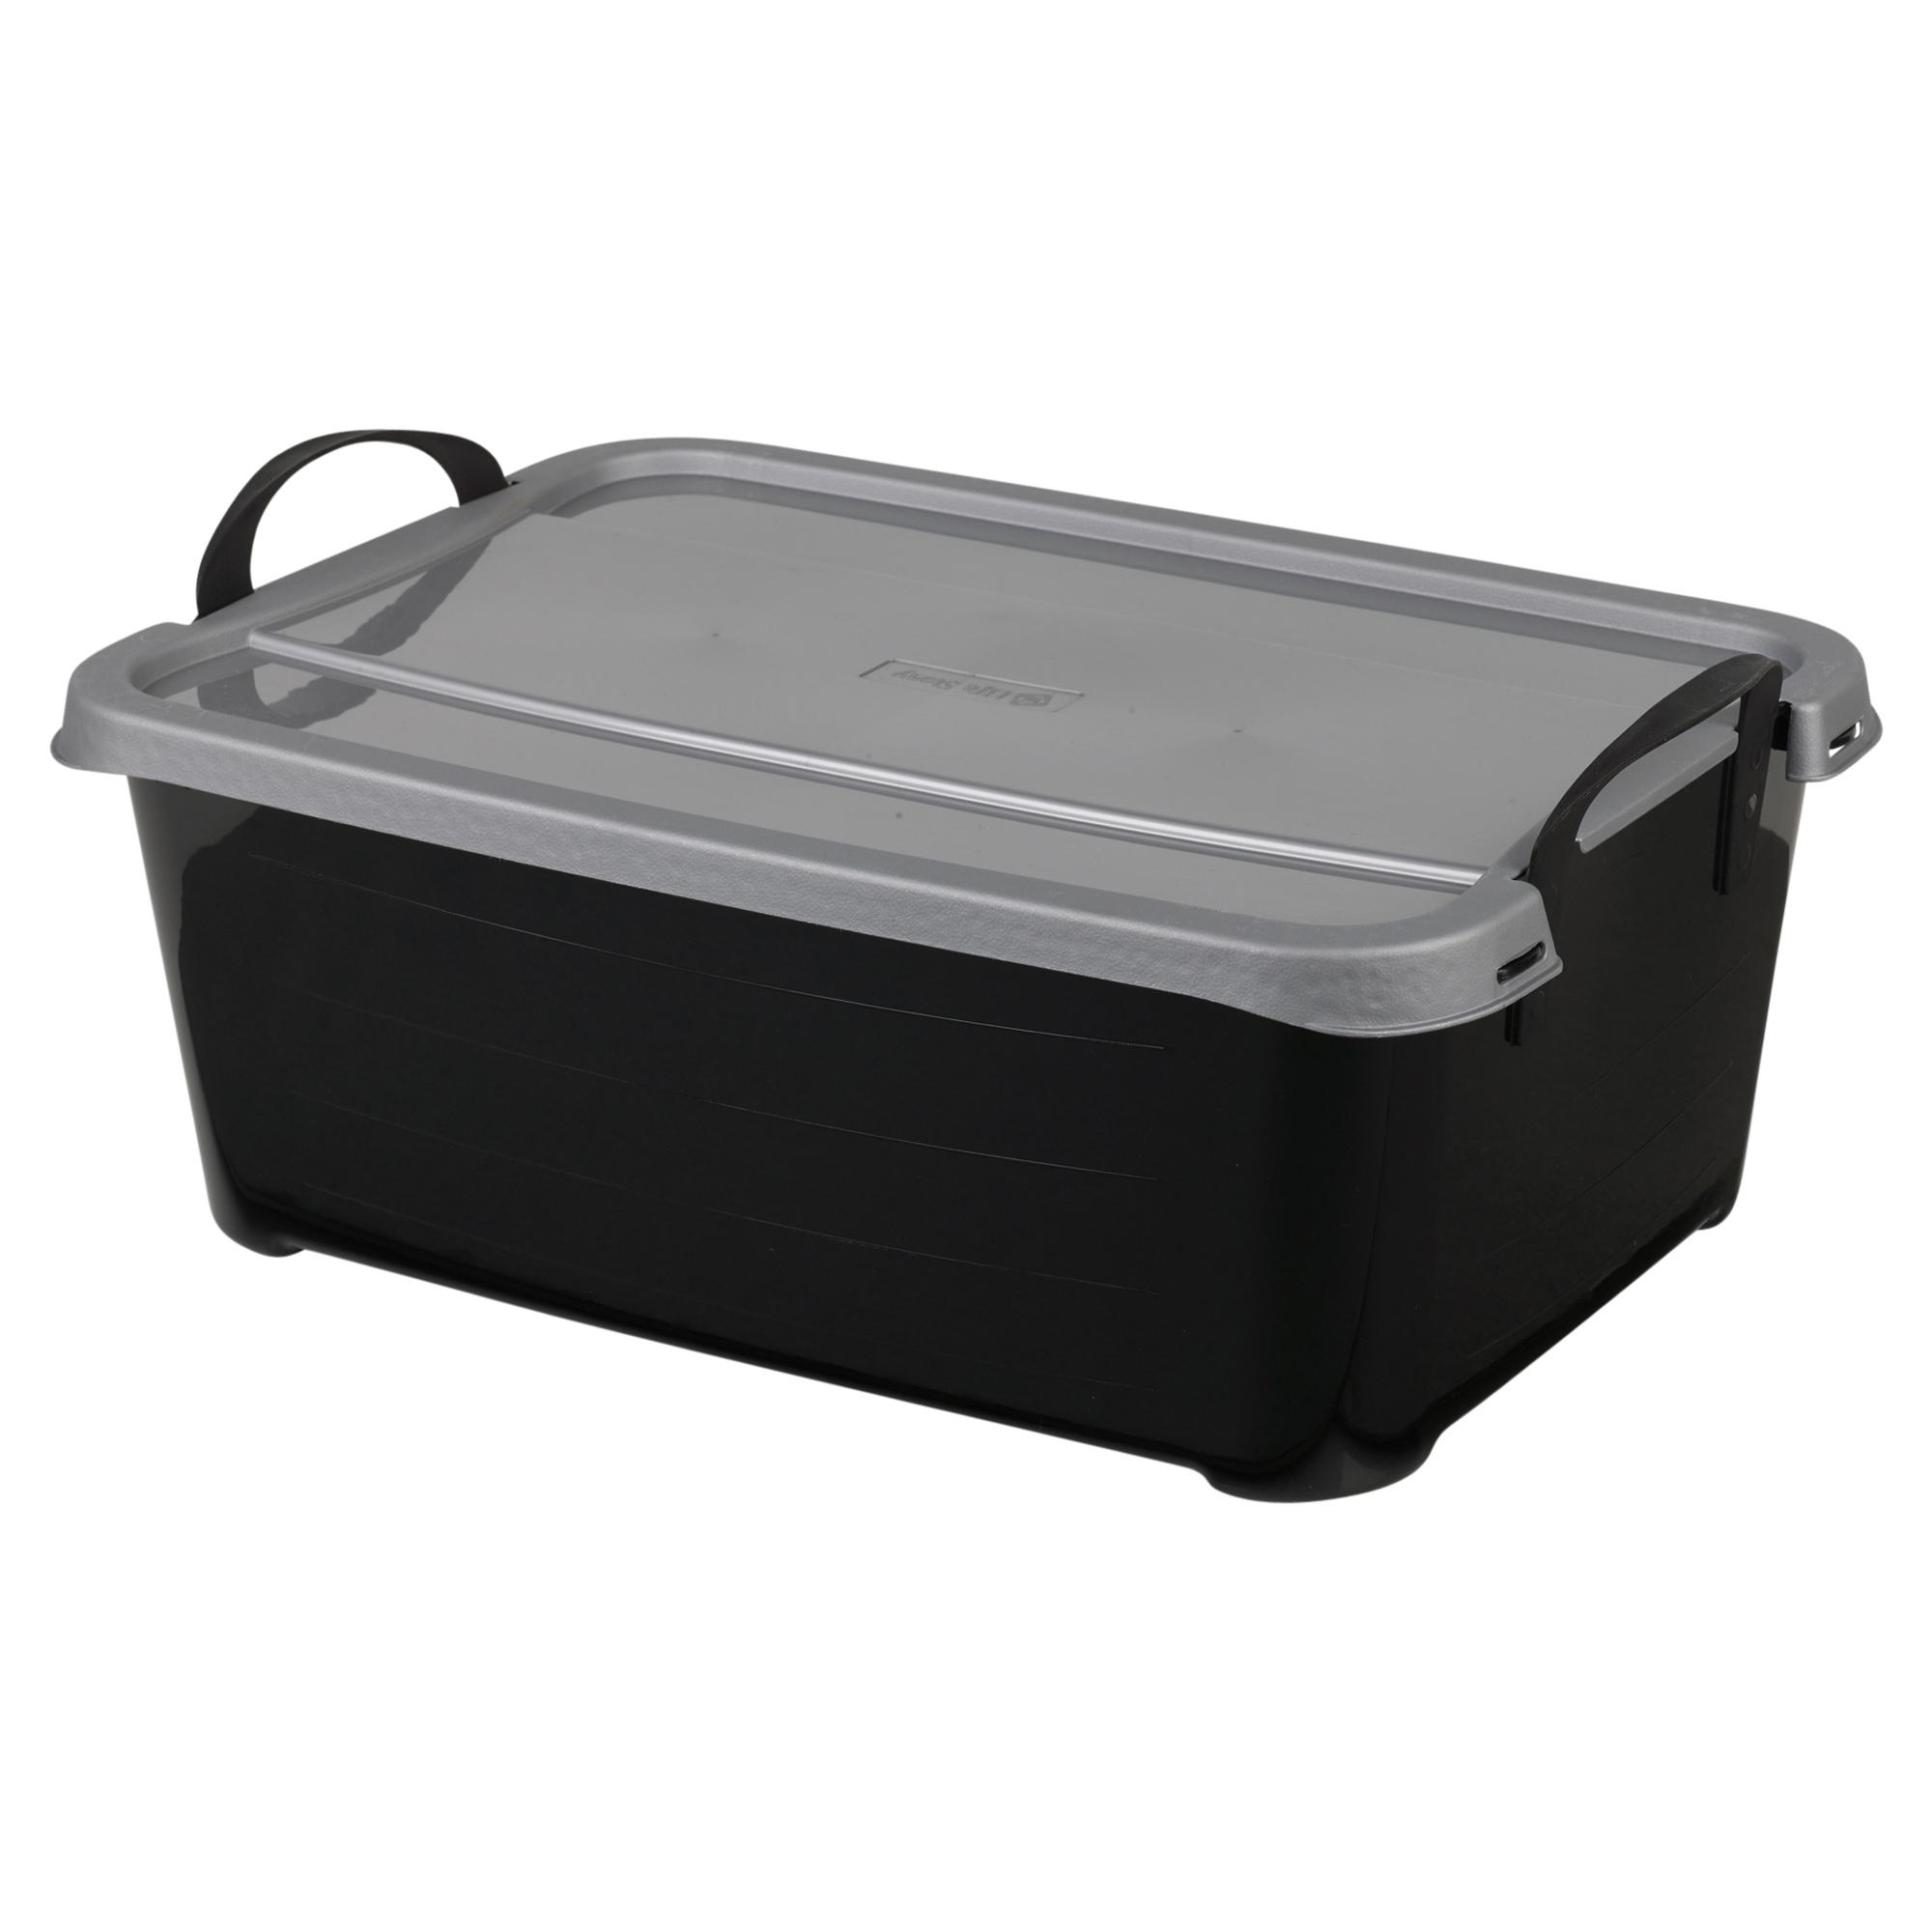 underbed plastic storage boxes with lids carry handles. Black Bedroom Furniture Sets. Home Design Ideas